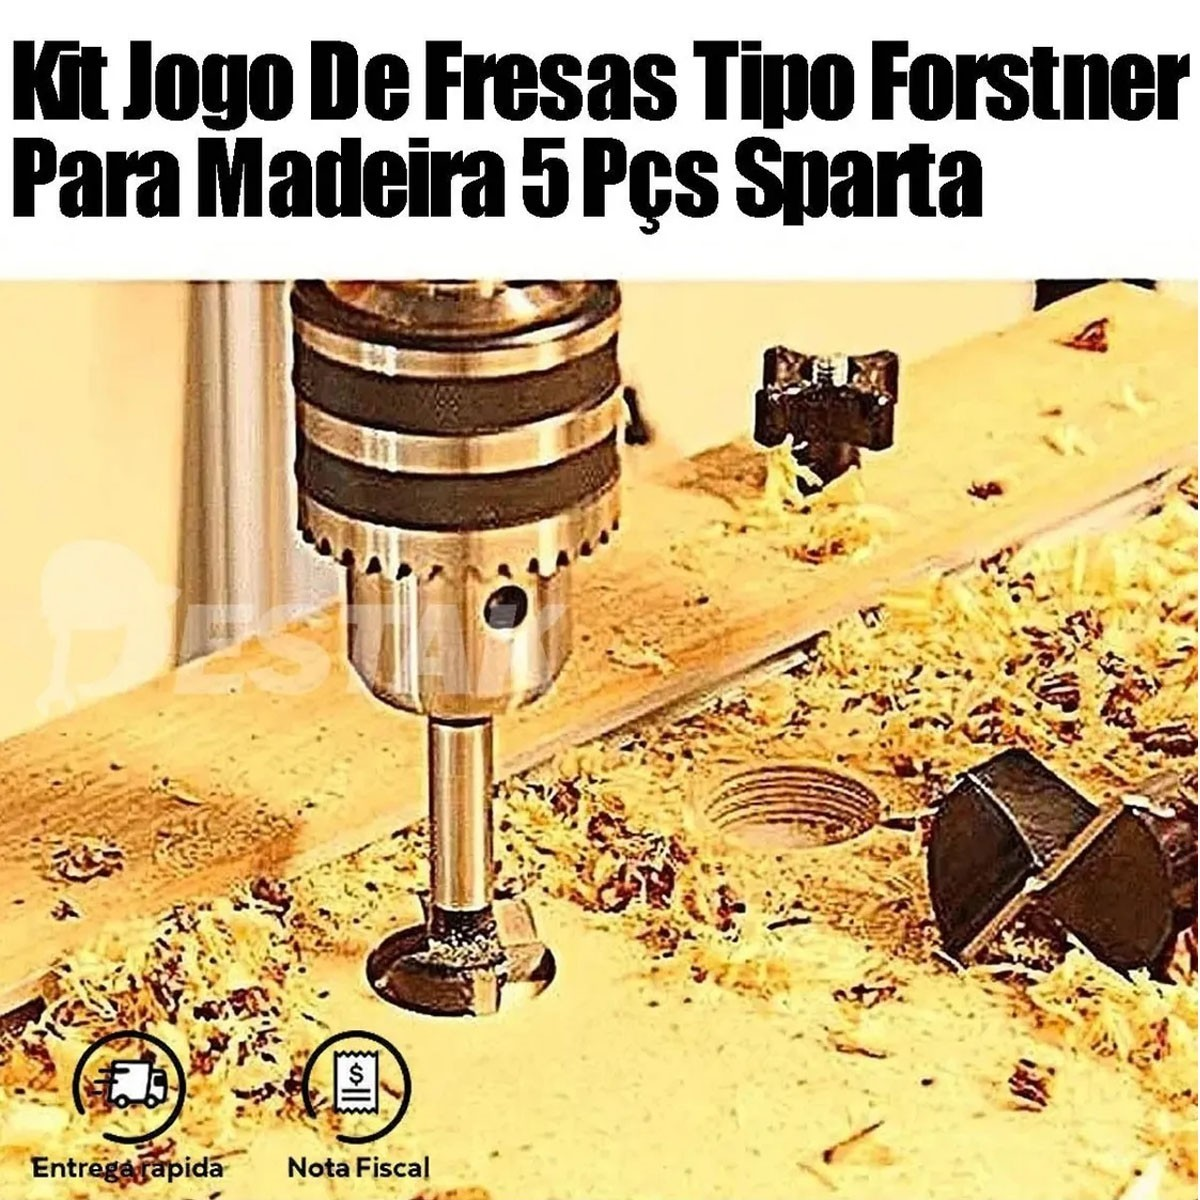 kit Retífica Reta Pneumática 1/4 + 74 Acessórios Micro Retífica